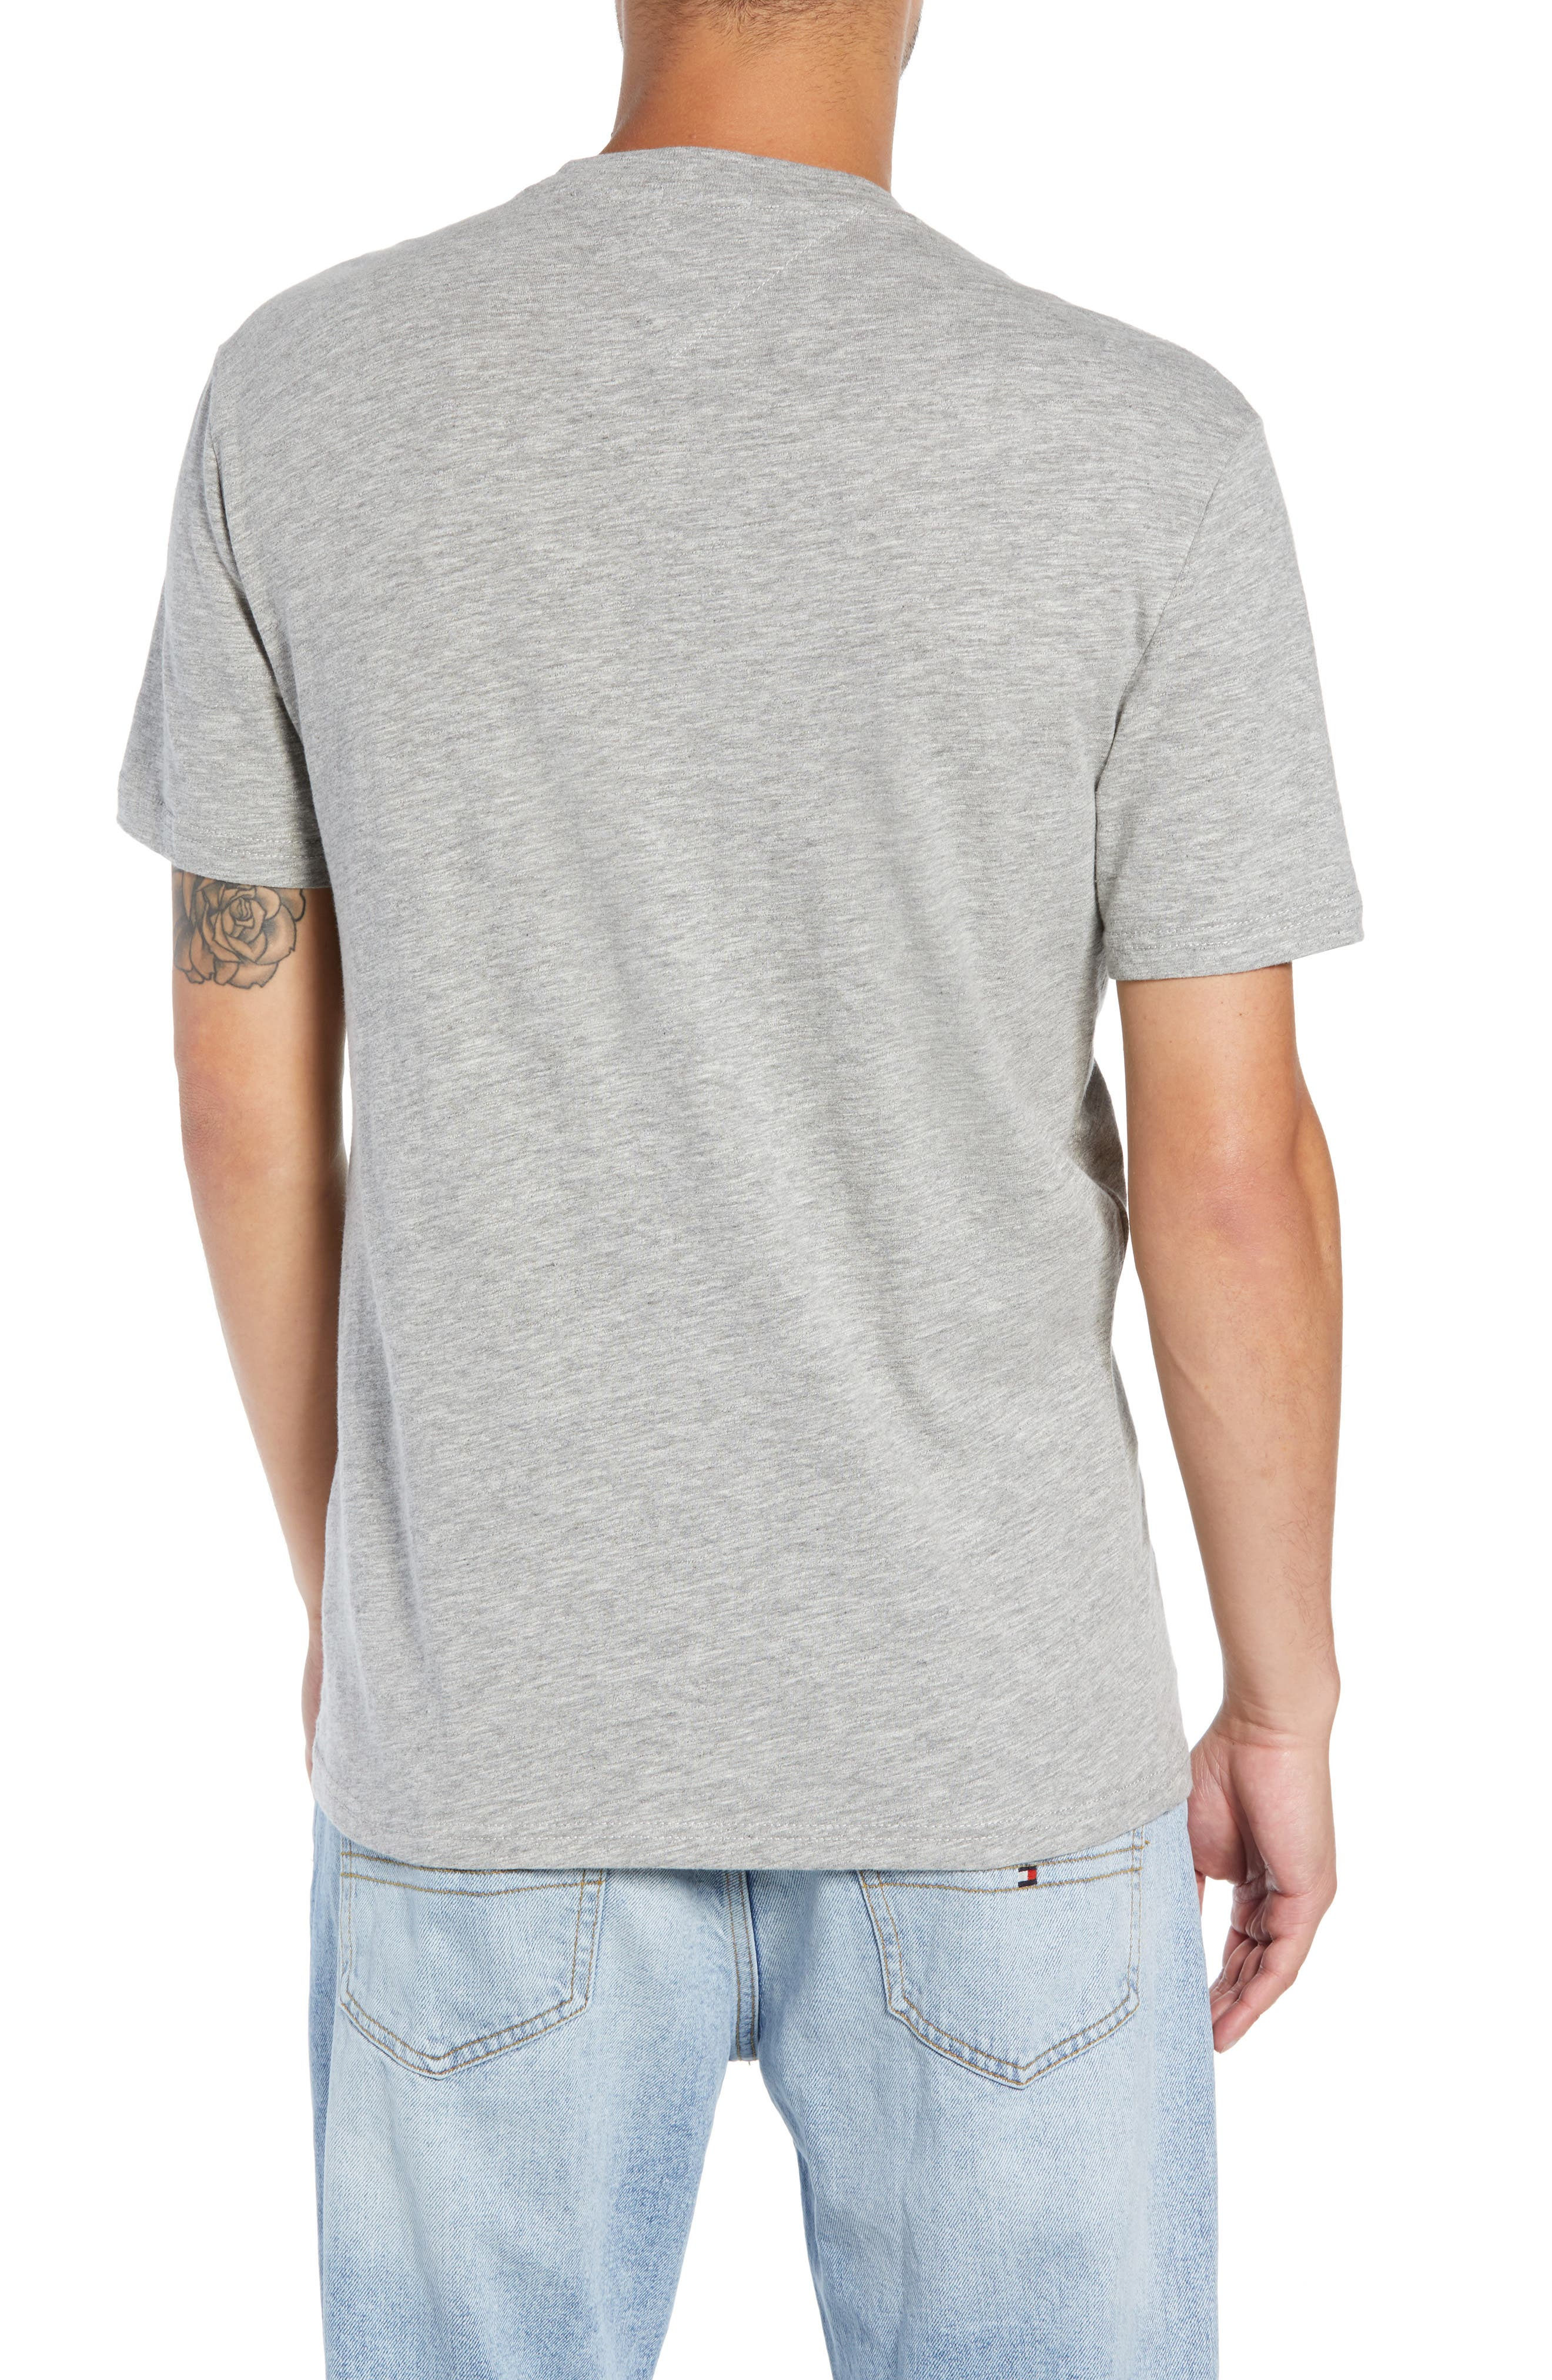 Collegiate Graphic T-Shirt,                             Alternate thumbnail 2, color,                             LIGHT GREY HEATHER